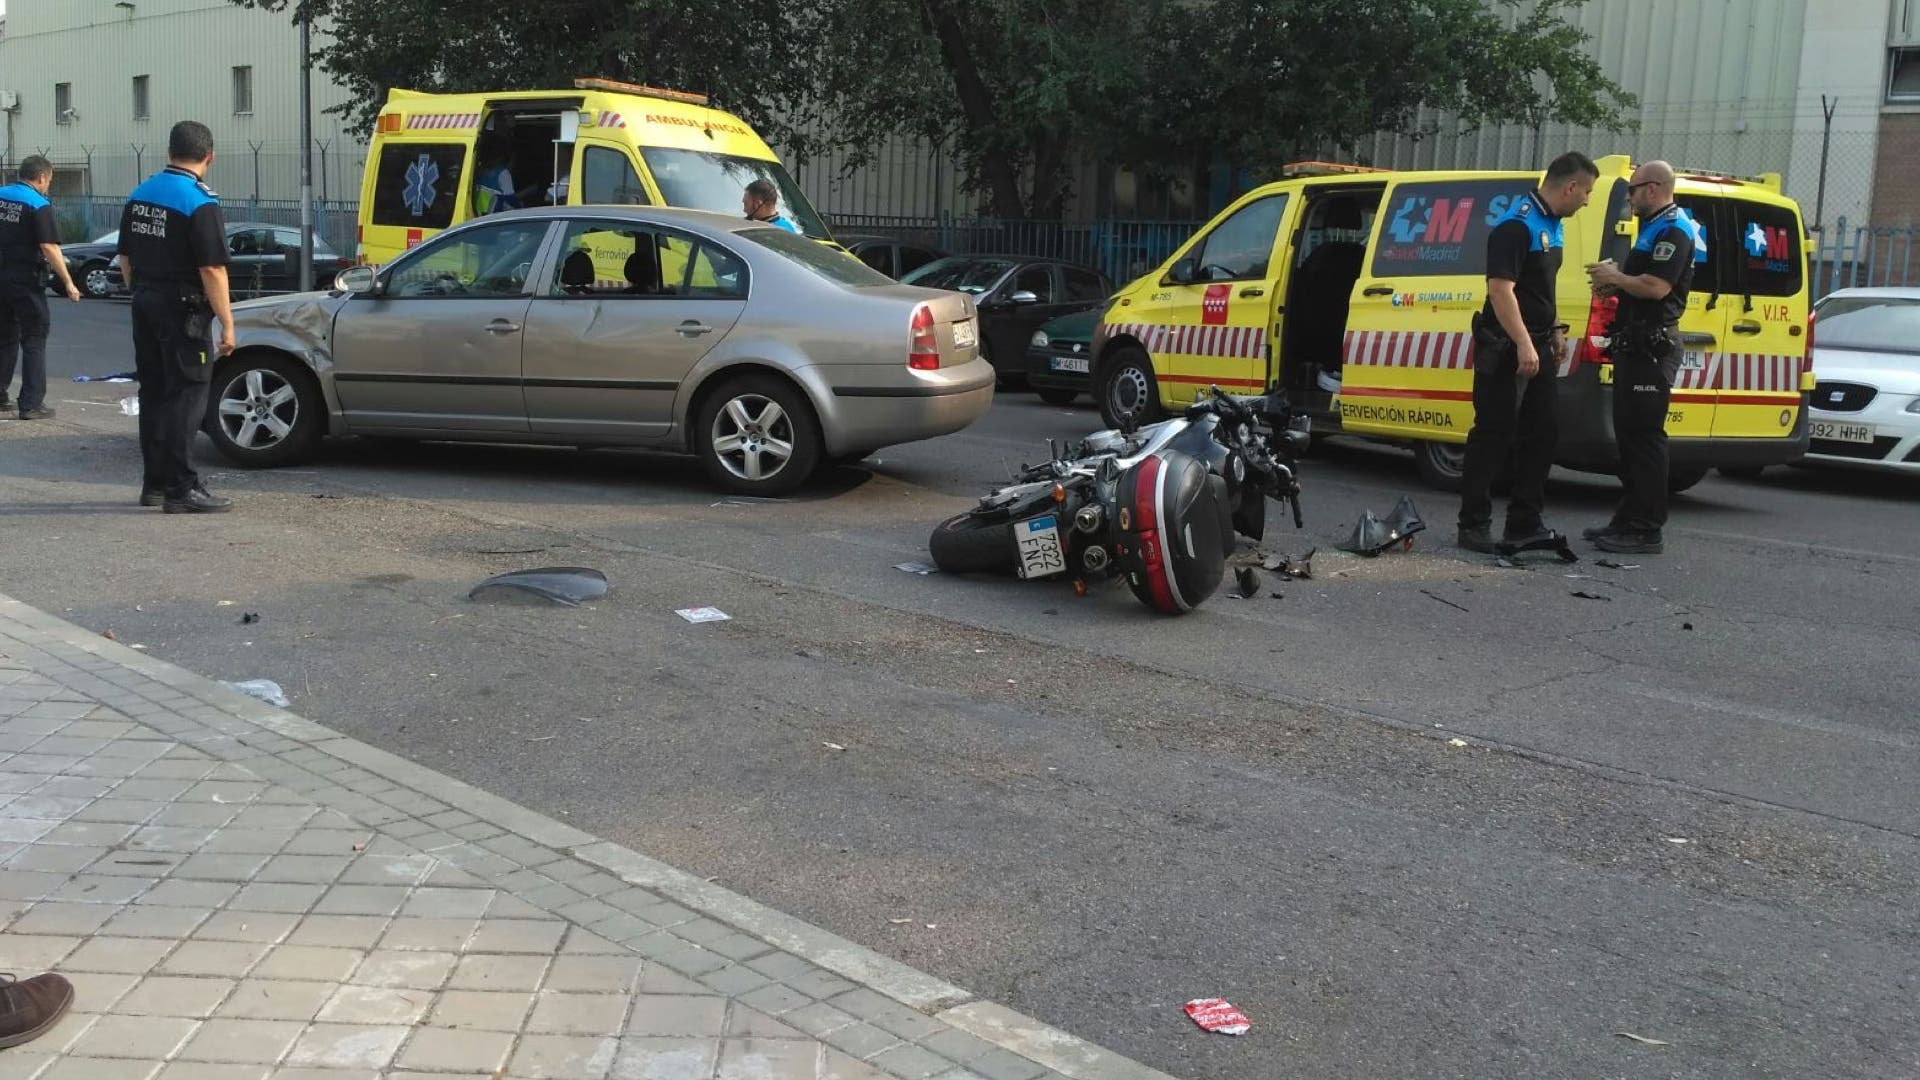 Imagen del accidente remitida a MIraCorredor.tv.